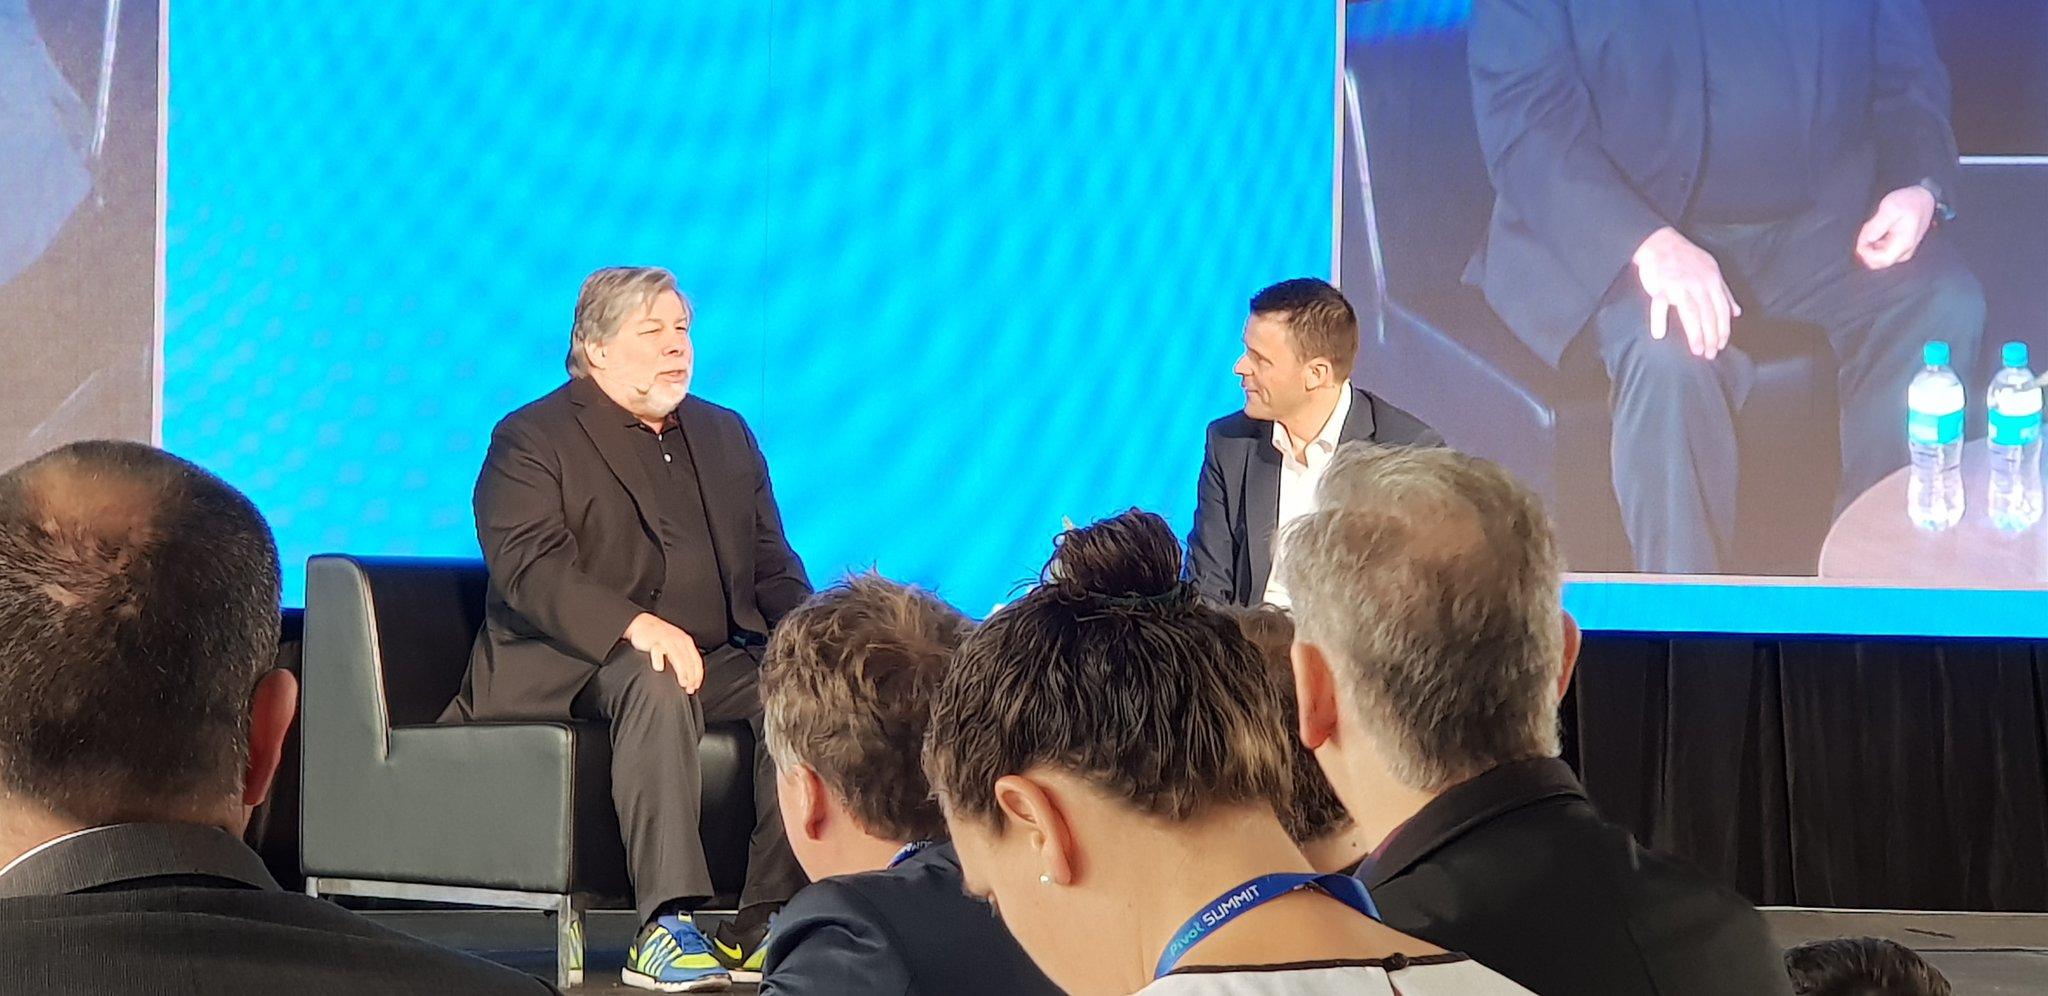 Steve Wozniak Pivot Summit   Crédito: @MishManners